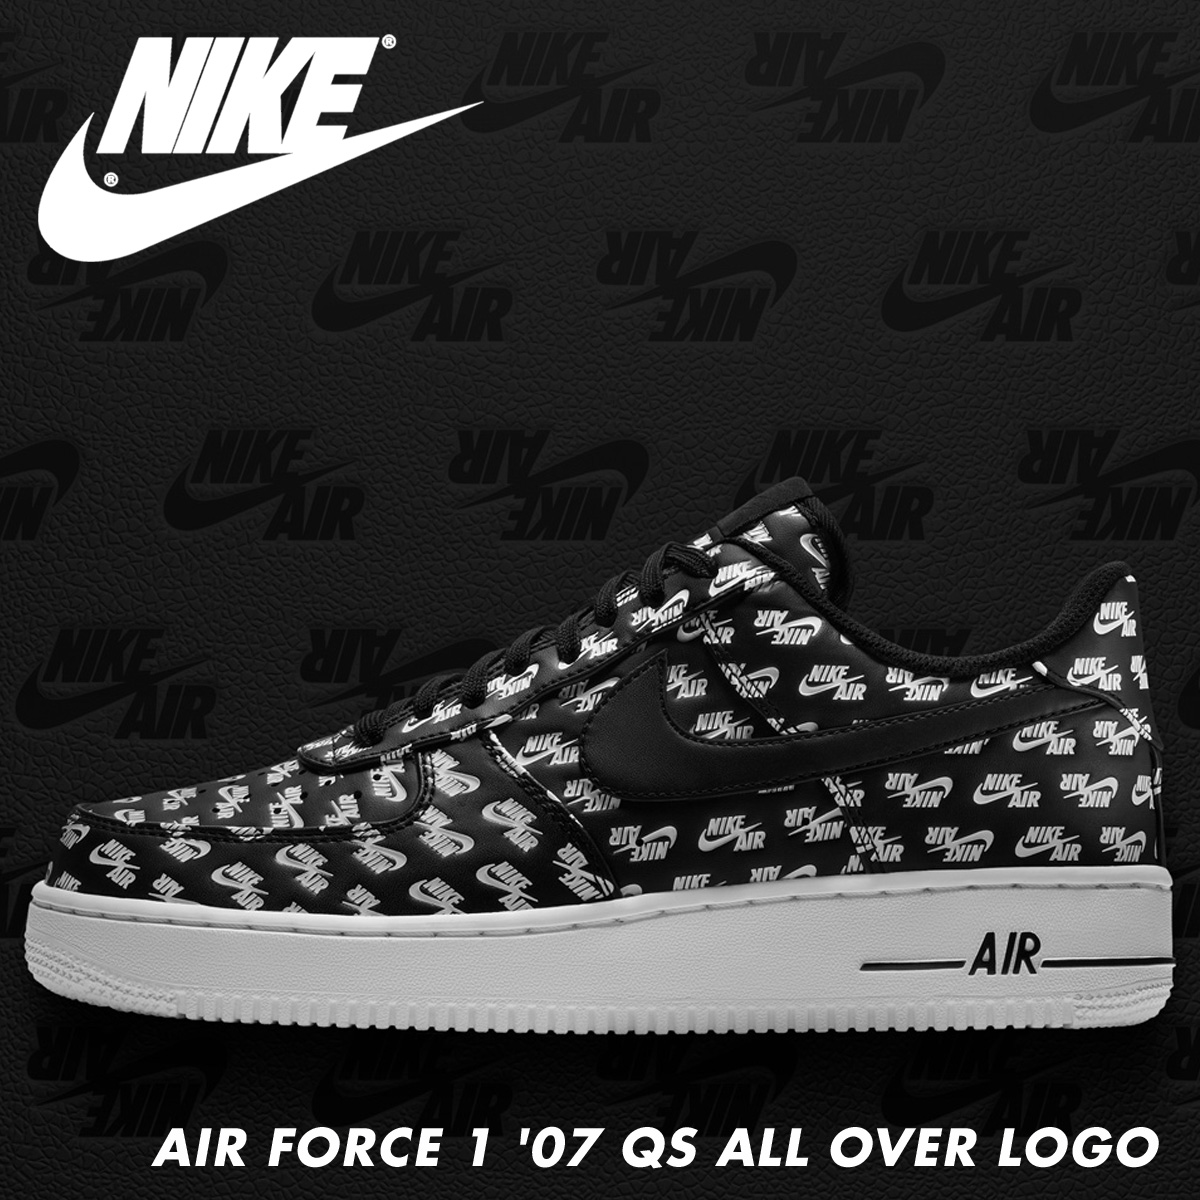 NIKE Nike air force 1 07 QS sneakers men AIR FORCE 1 ALL OVER LOGO AH8462 001 black black